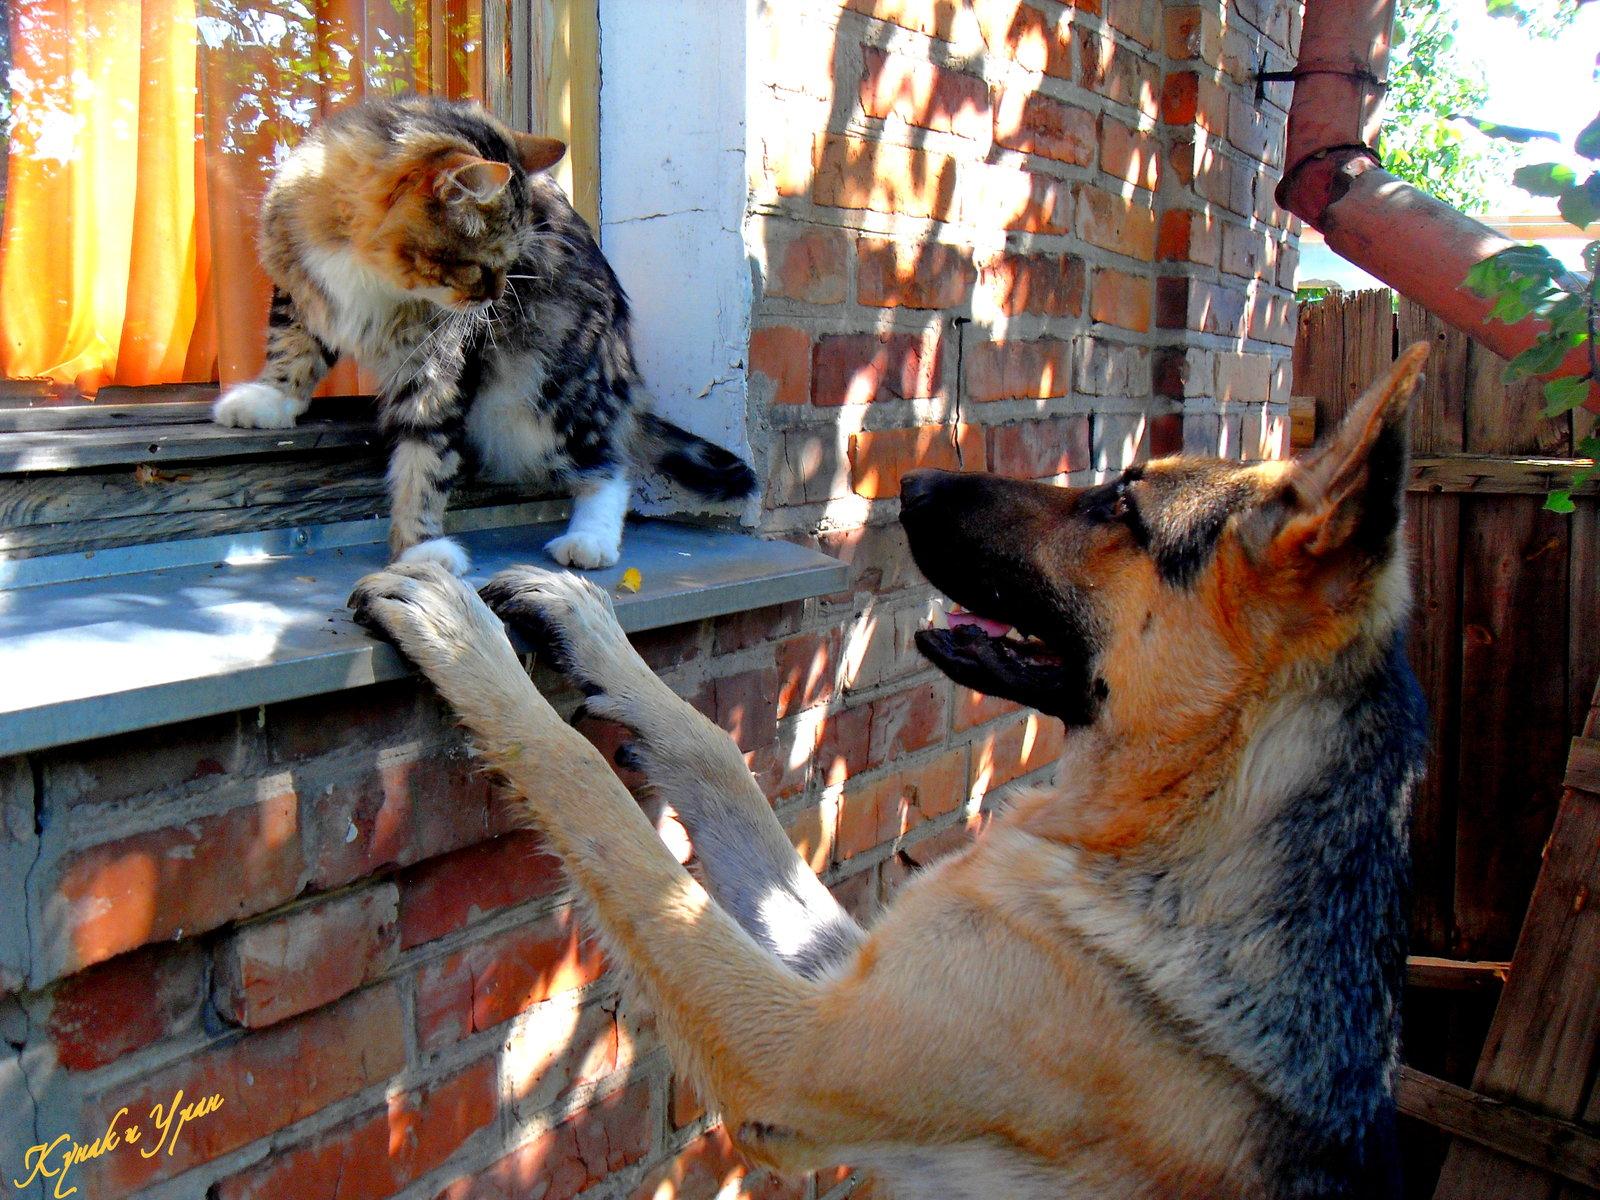 East-European Shepherd dog and a cat wallpaper